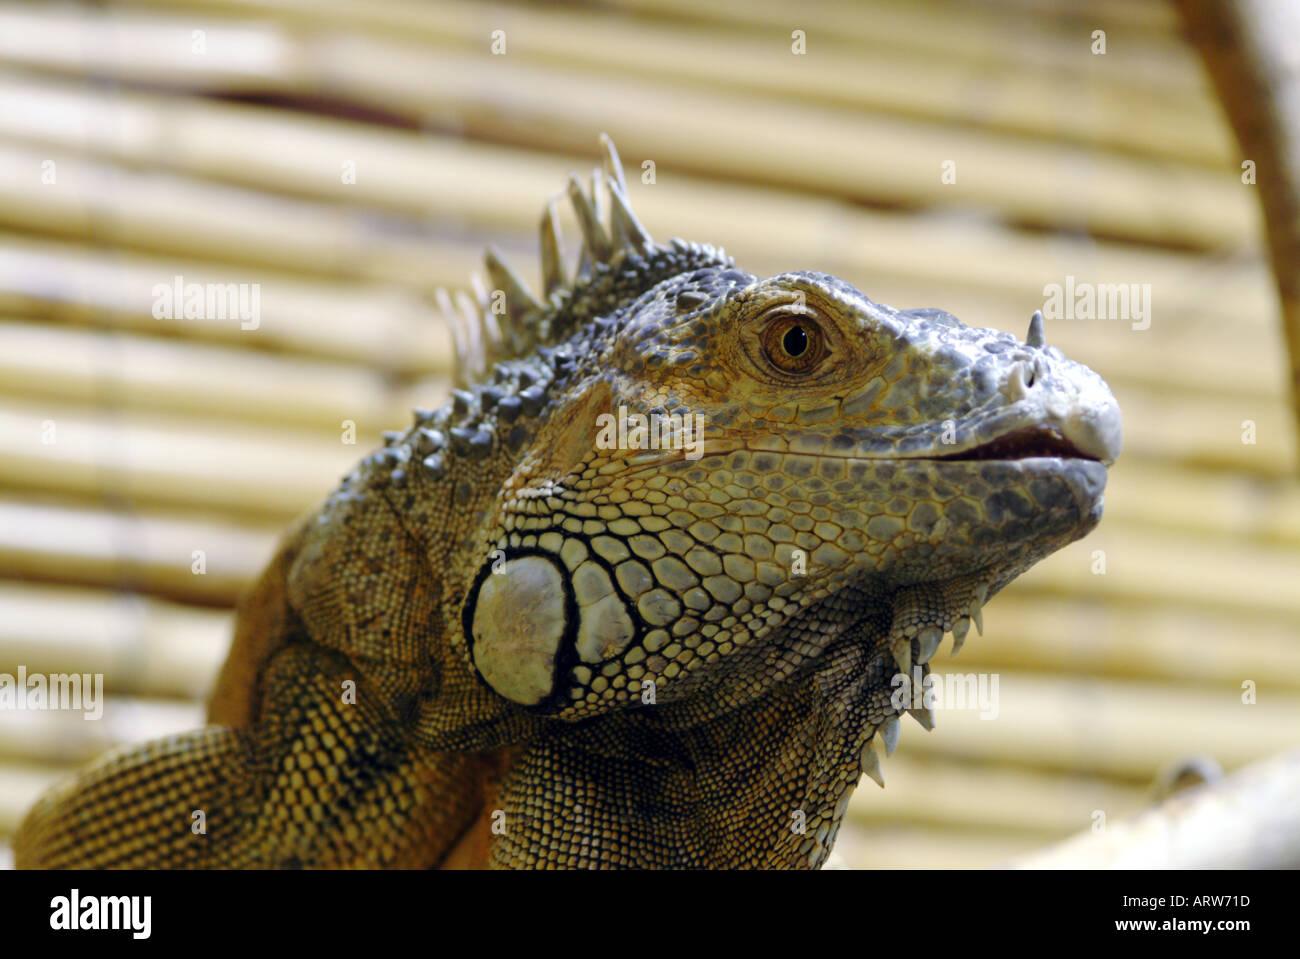 An Iguana showing his little teeth in the Serpentarium on Skye Scotland Stock Photo